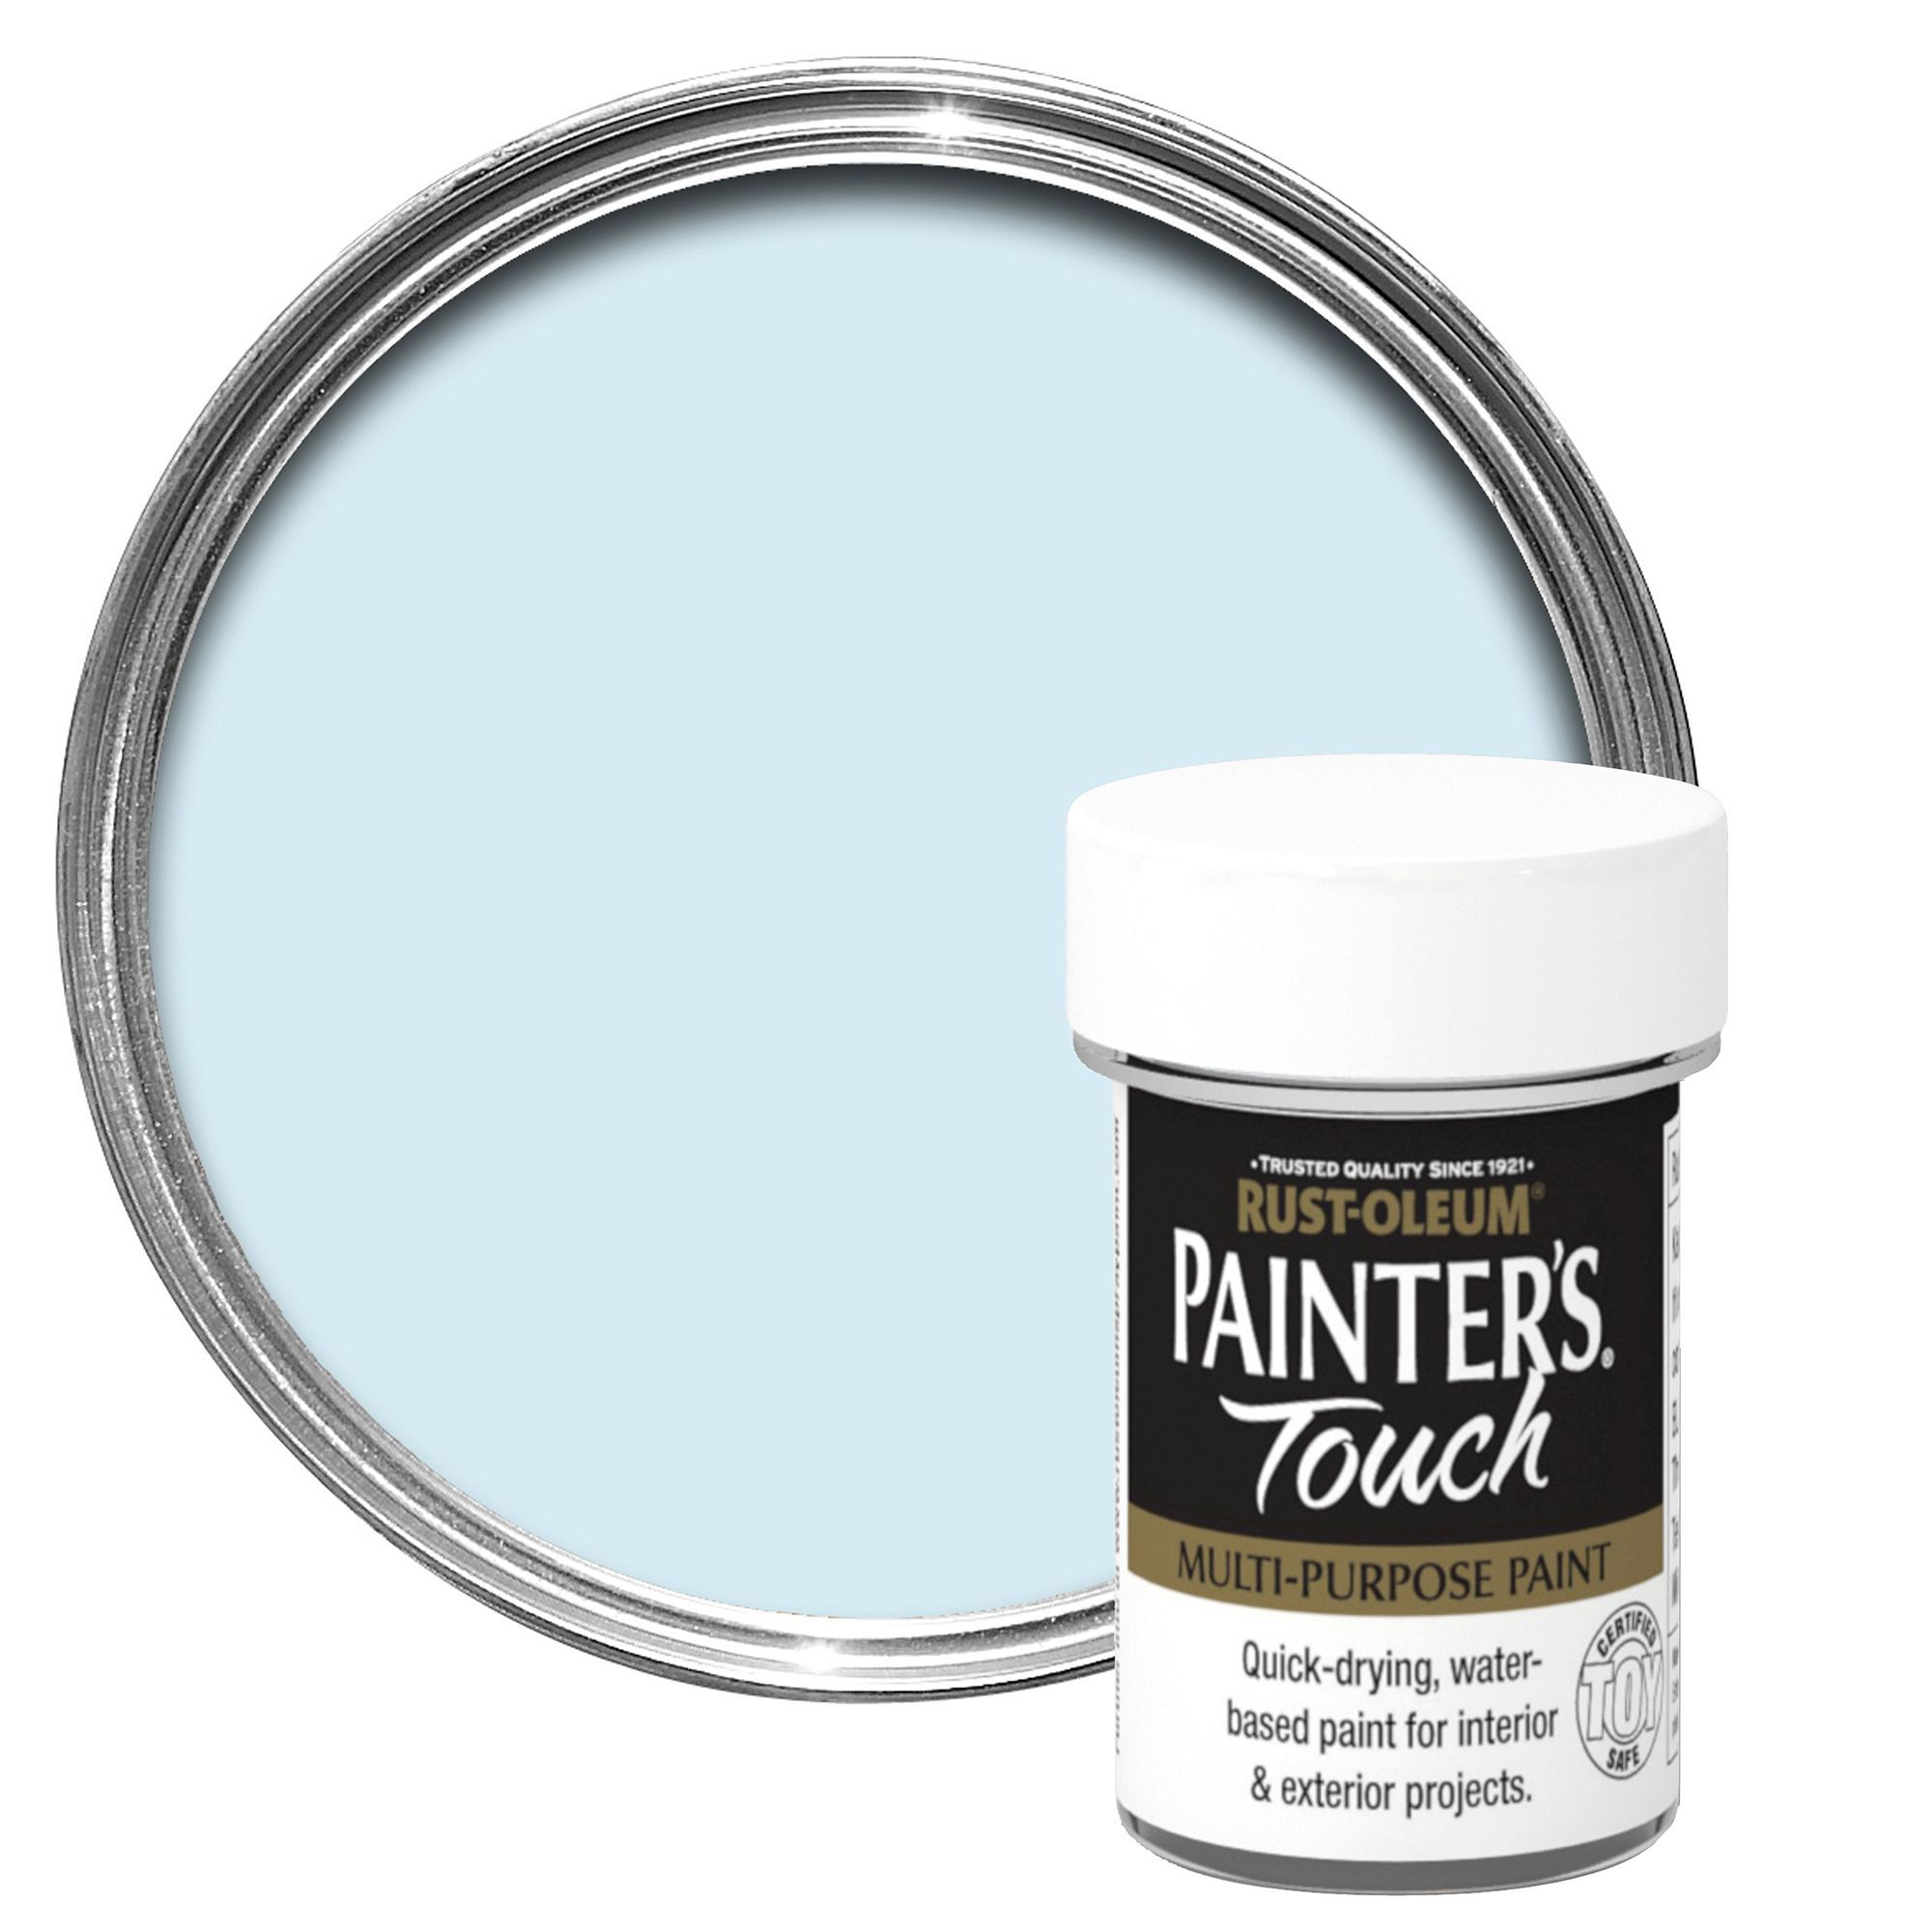 Rust-oleum Painter's Touch Interior & Exterior Duck Egg Blue Gloss Multipurpose Paint 20ml